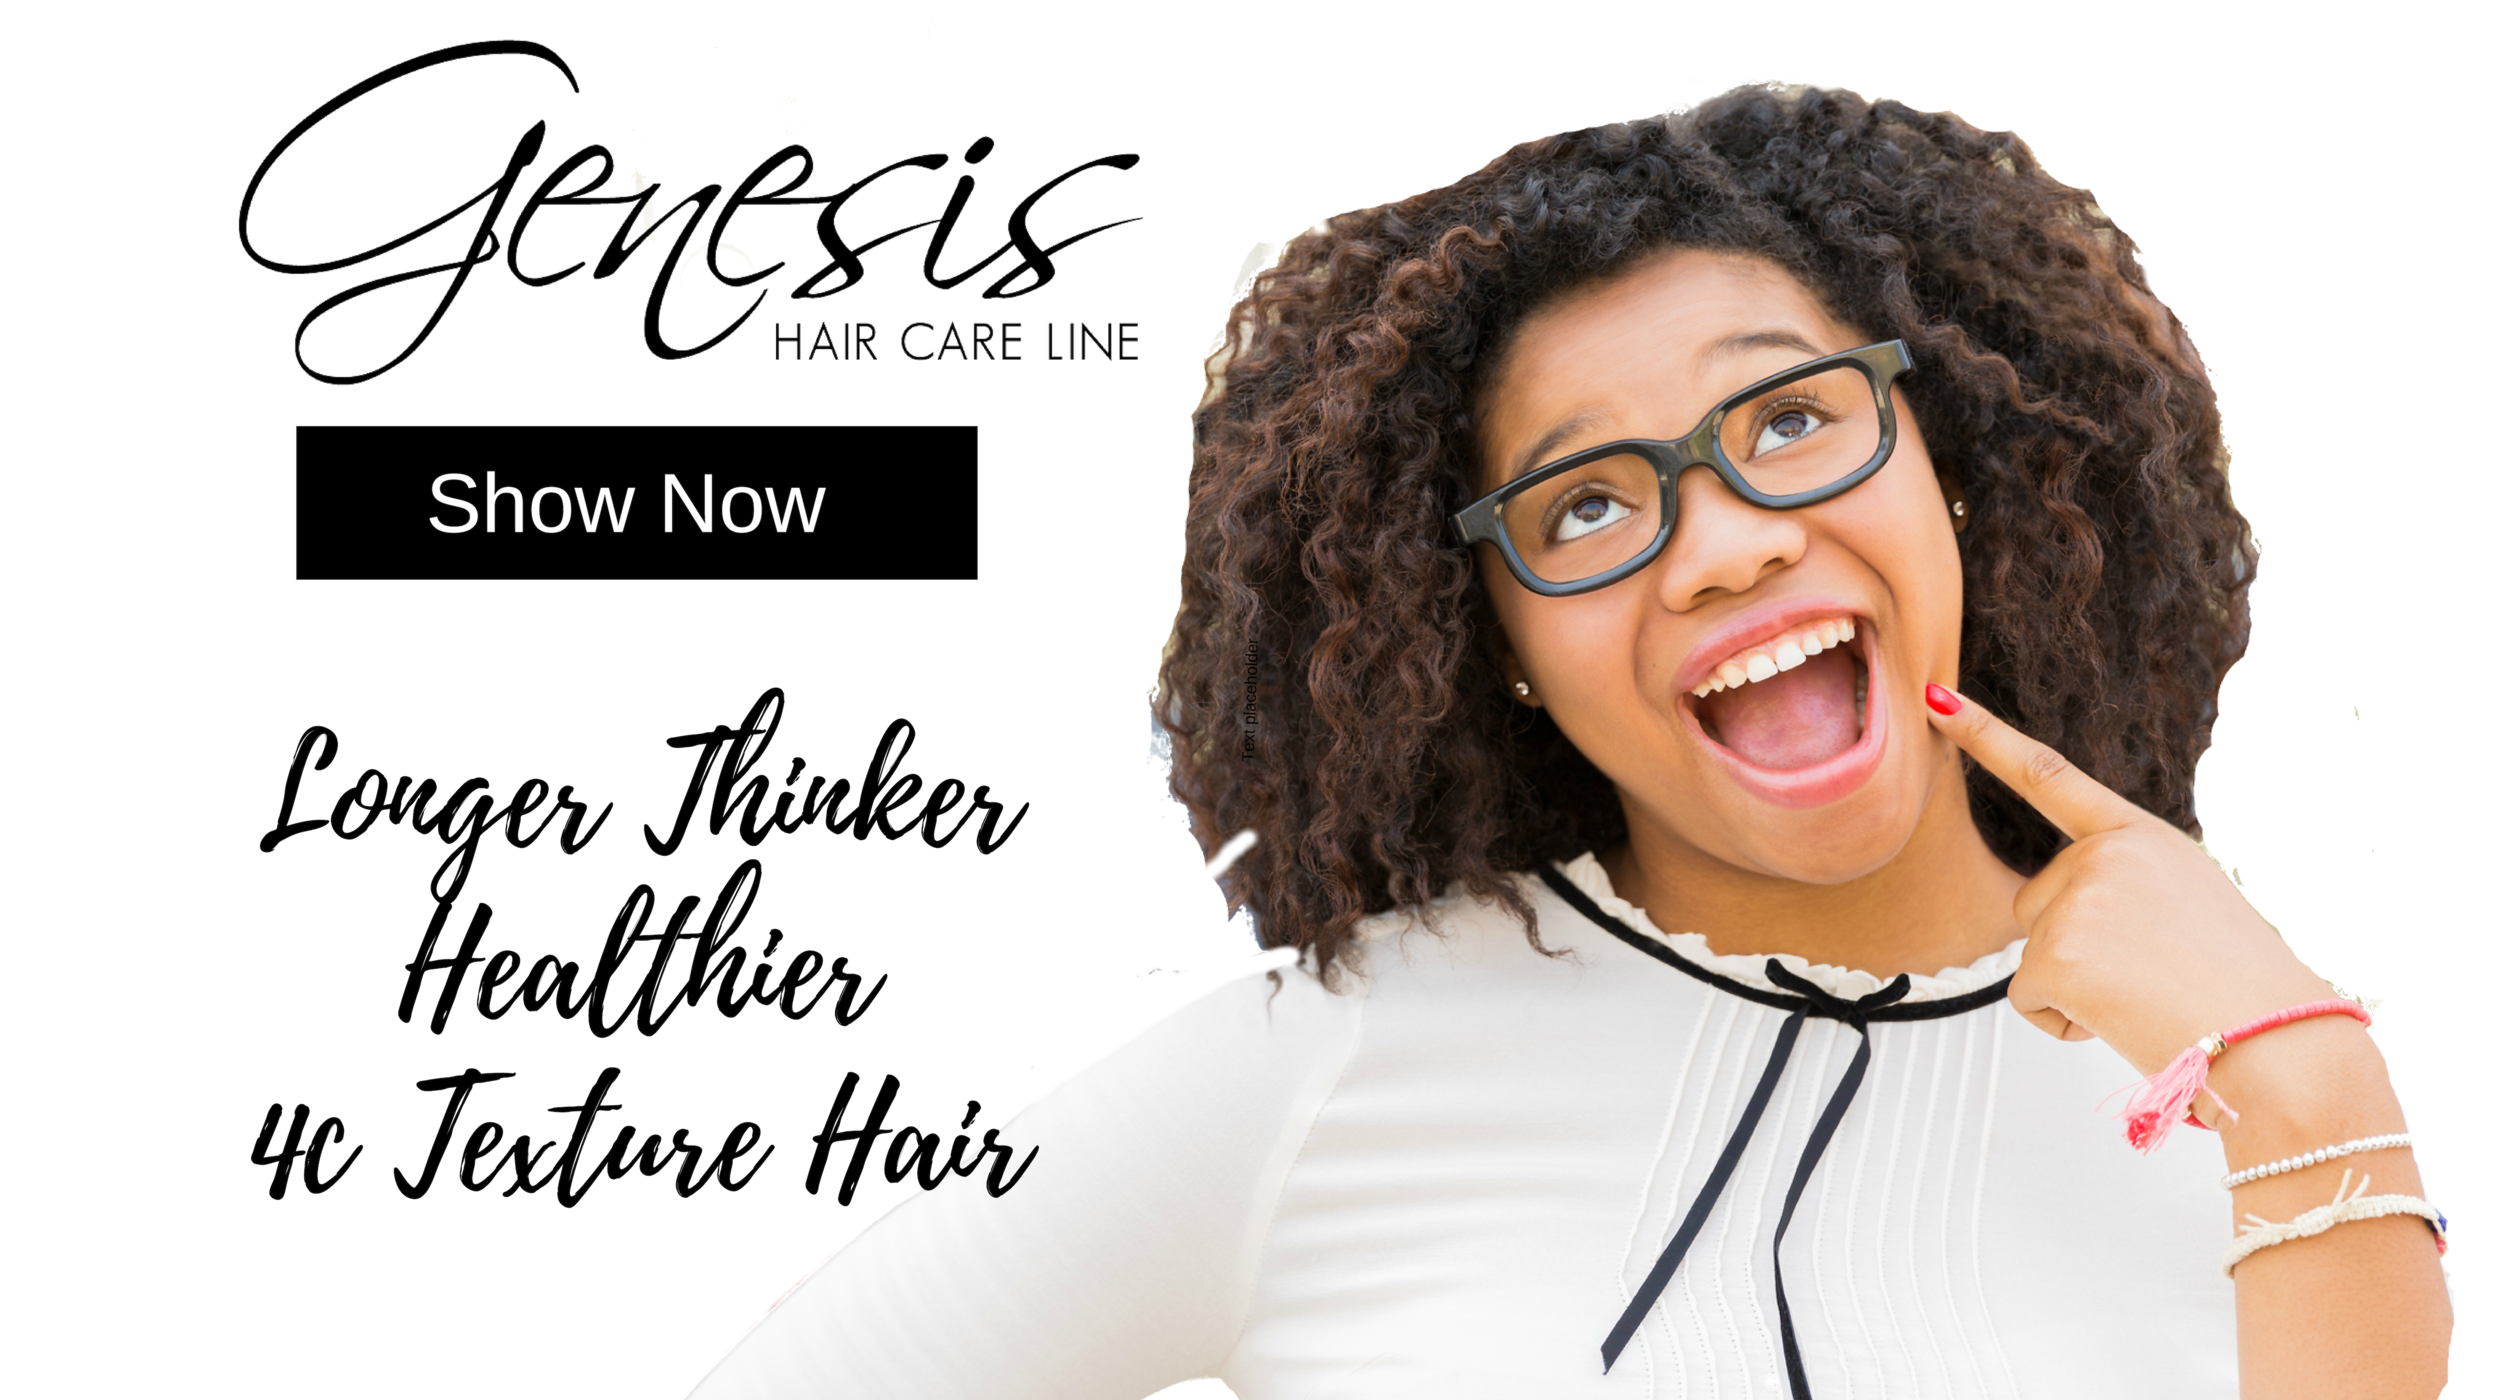 Longer Thicker healthier 4c Texture Hair